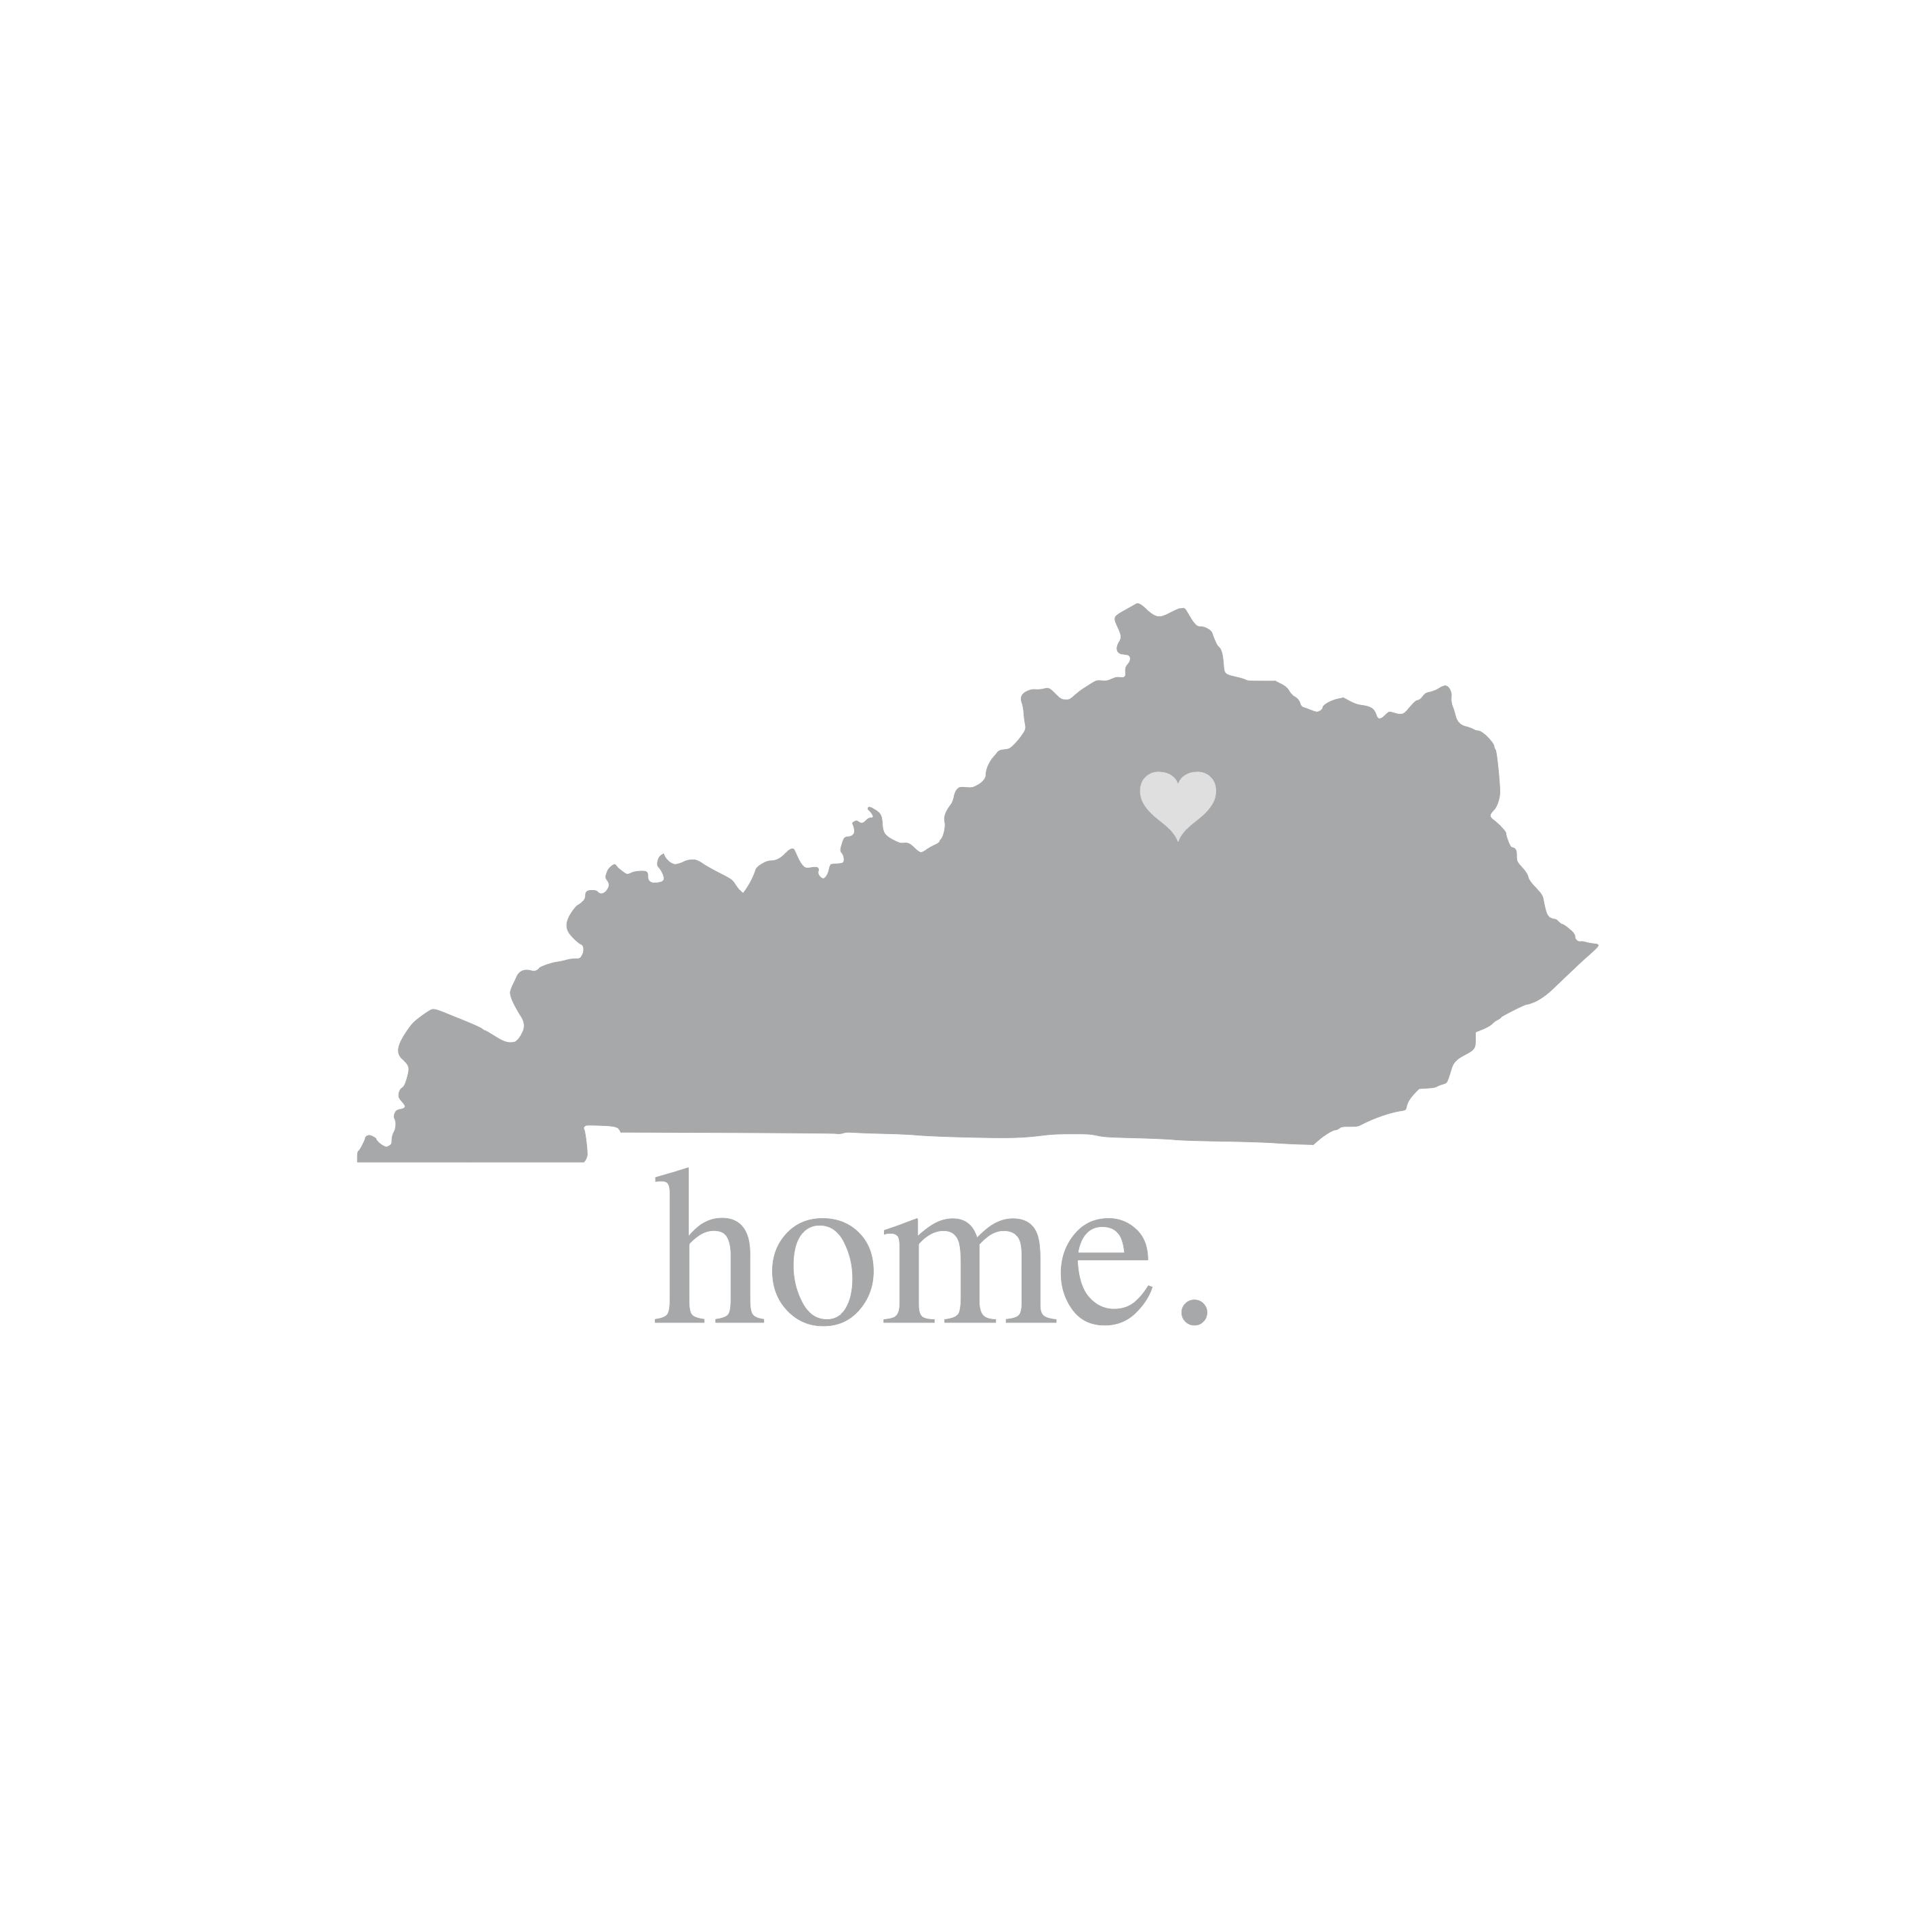 8160 Kentucky Home State